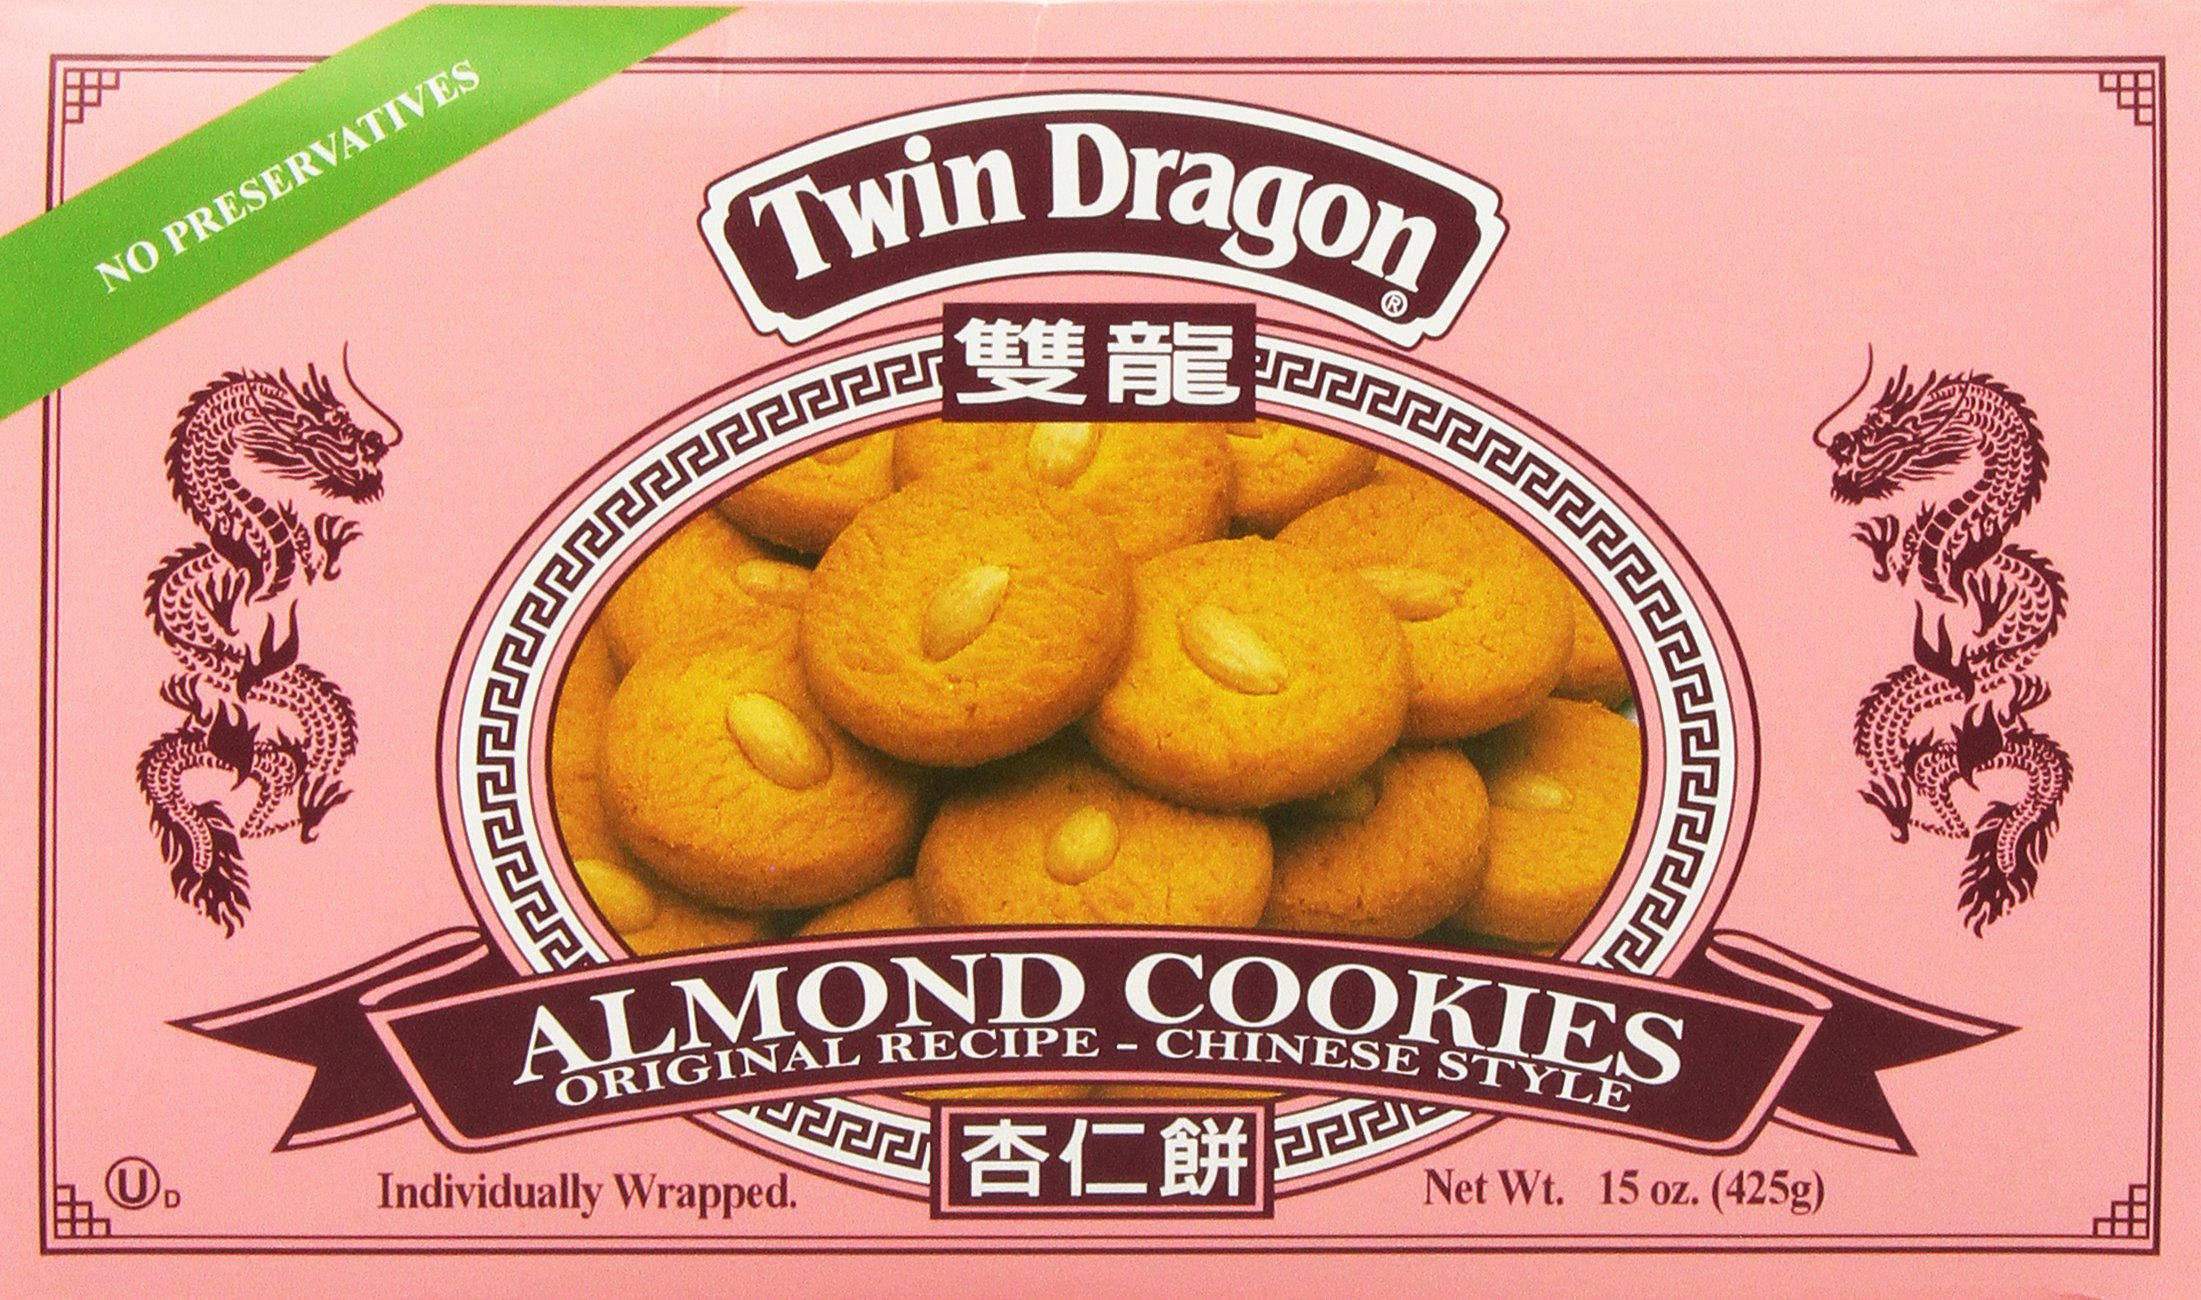 Twin Dragon Almond Cookies 15 Oz. by Twin Dragon